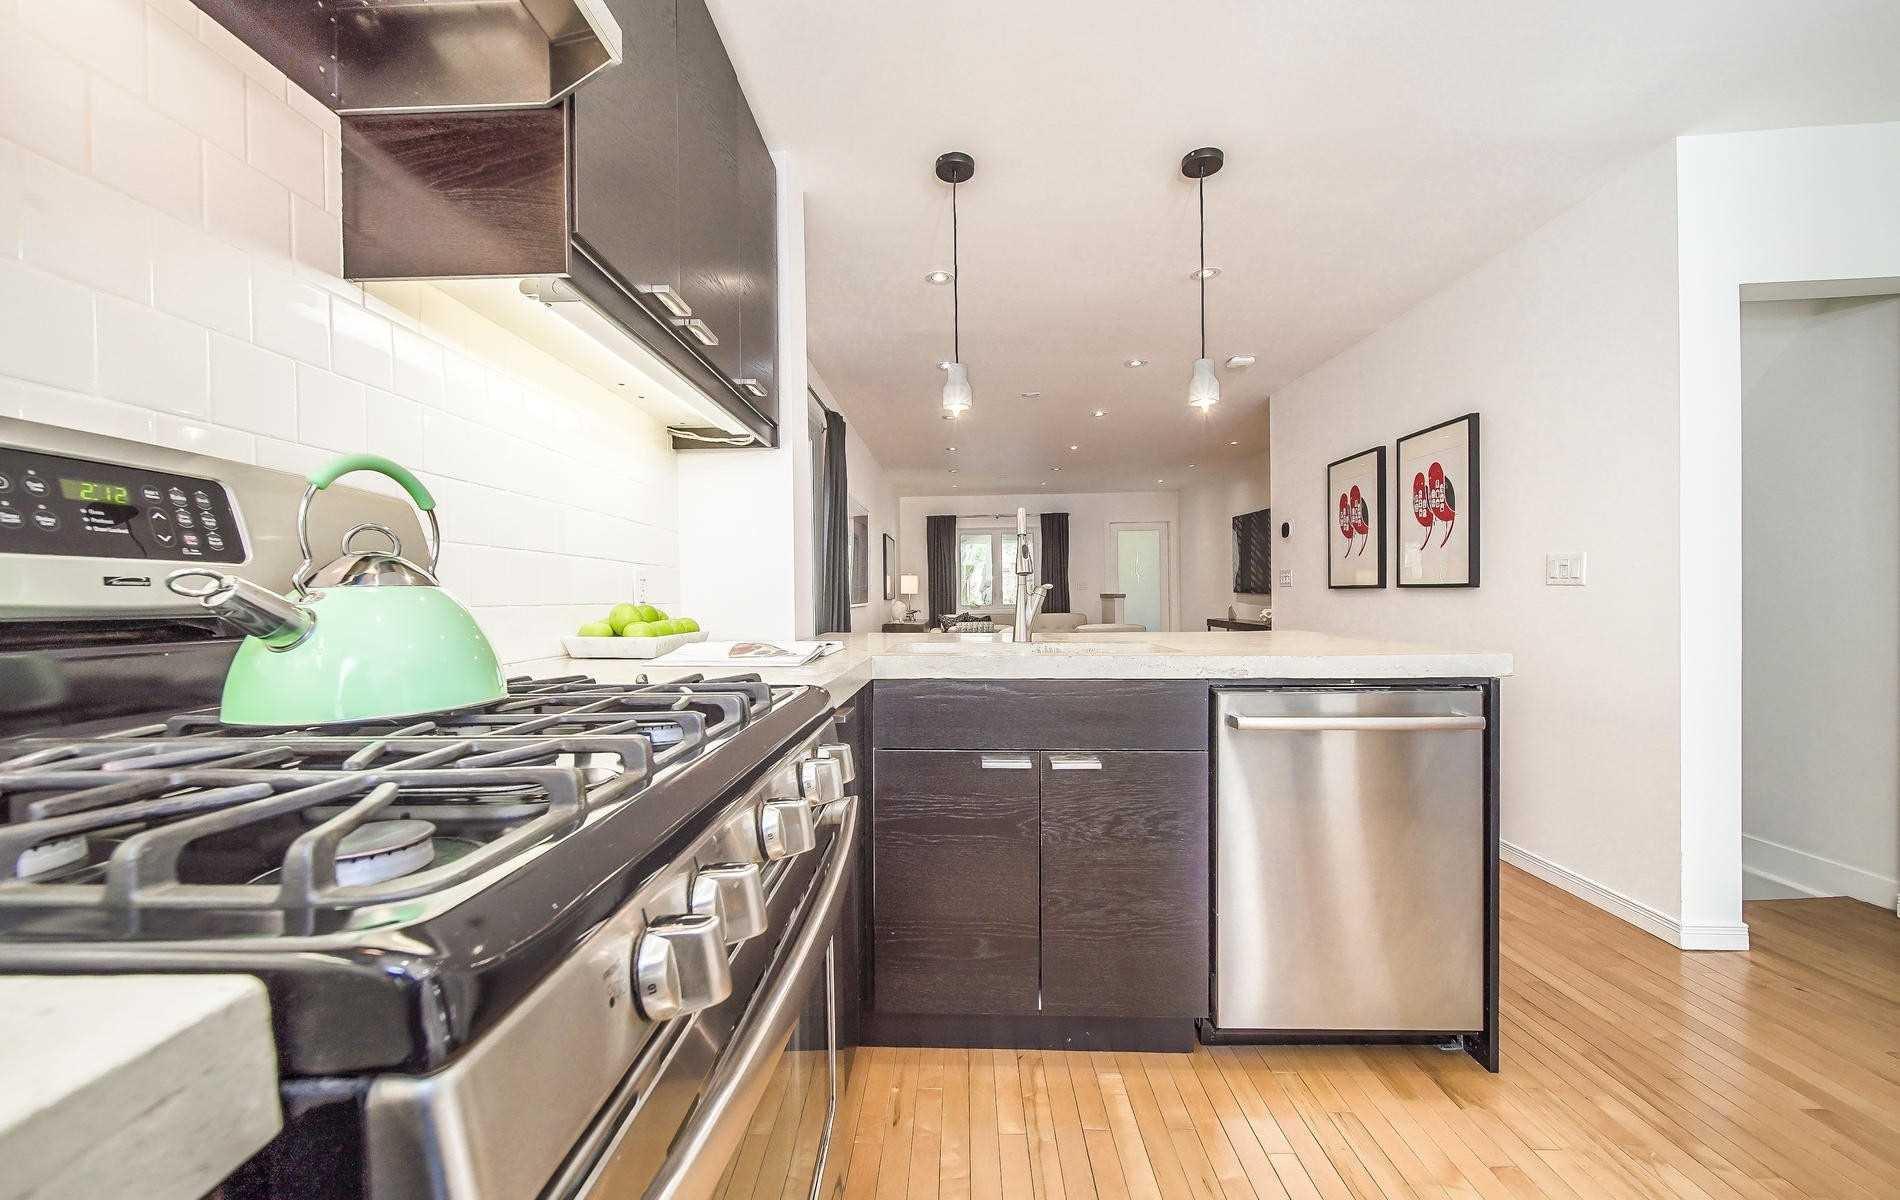 Photo 9: Photos: 64 Larchmount Avenue in Toronto: South Riverdale House (2-Storey) for sale (Toronto E01)  : MLS®# E4489752